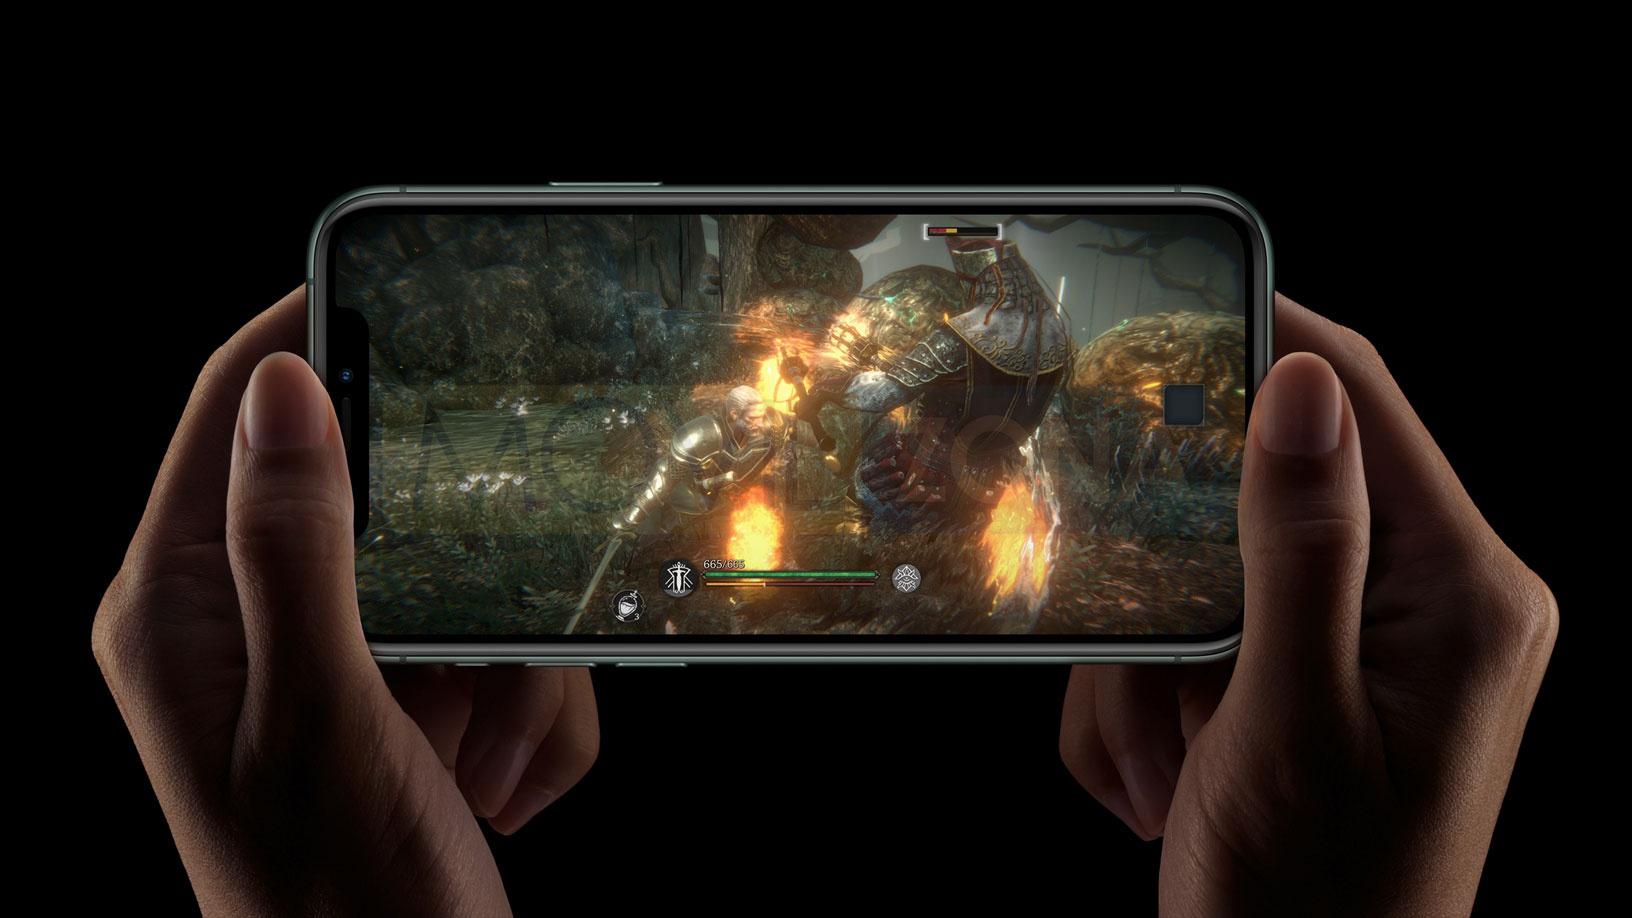 Apple iPhone 11 Pro Max juegos